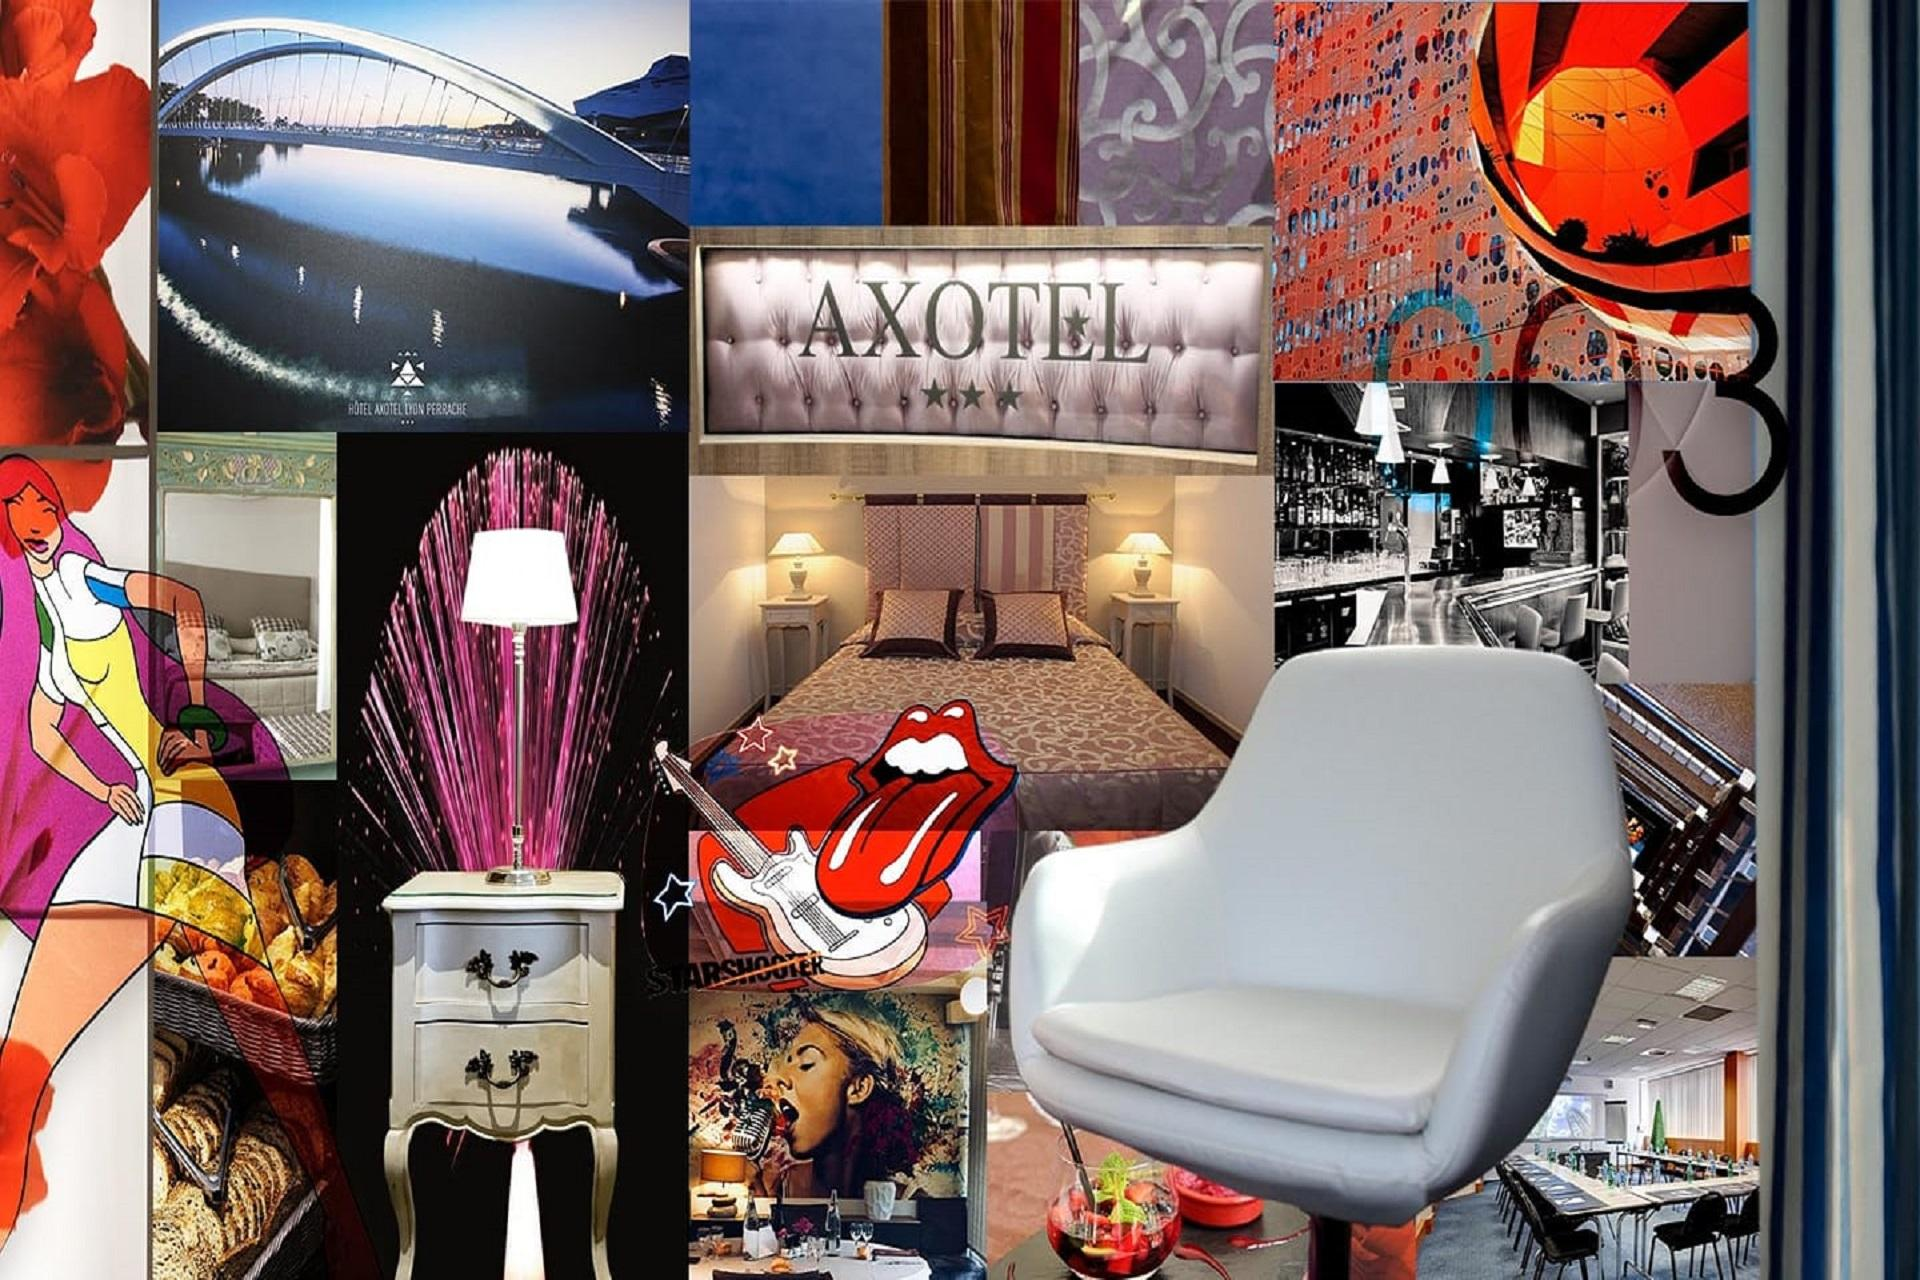 hotel-axotel-Happy-culture-lyon-perrache-pop-art